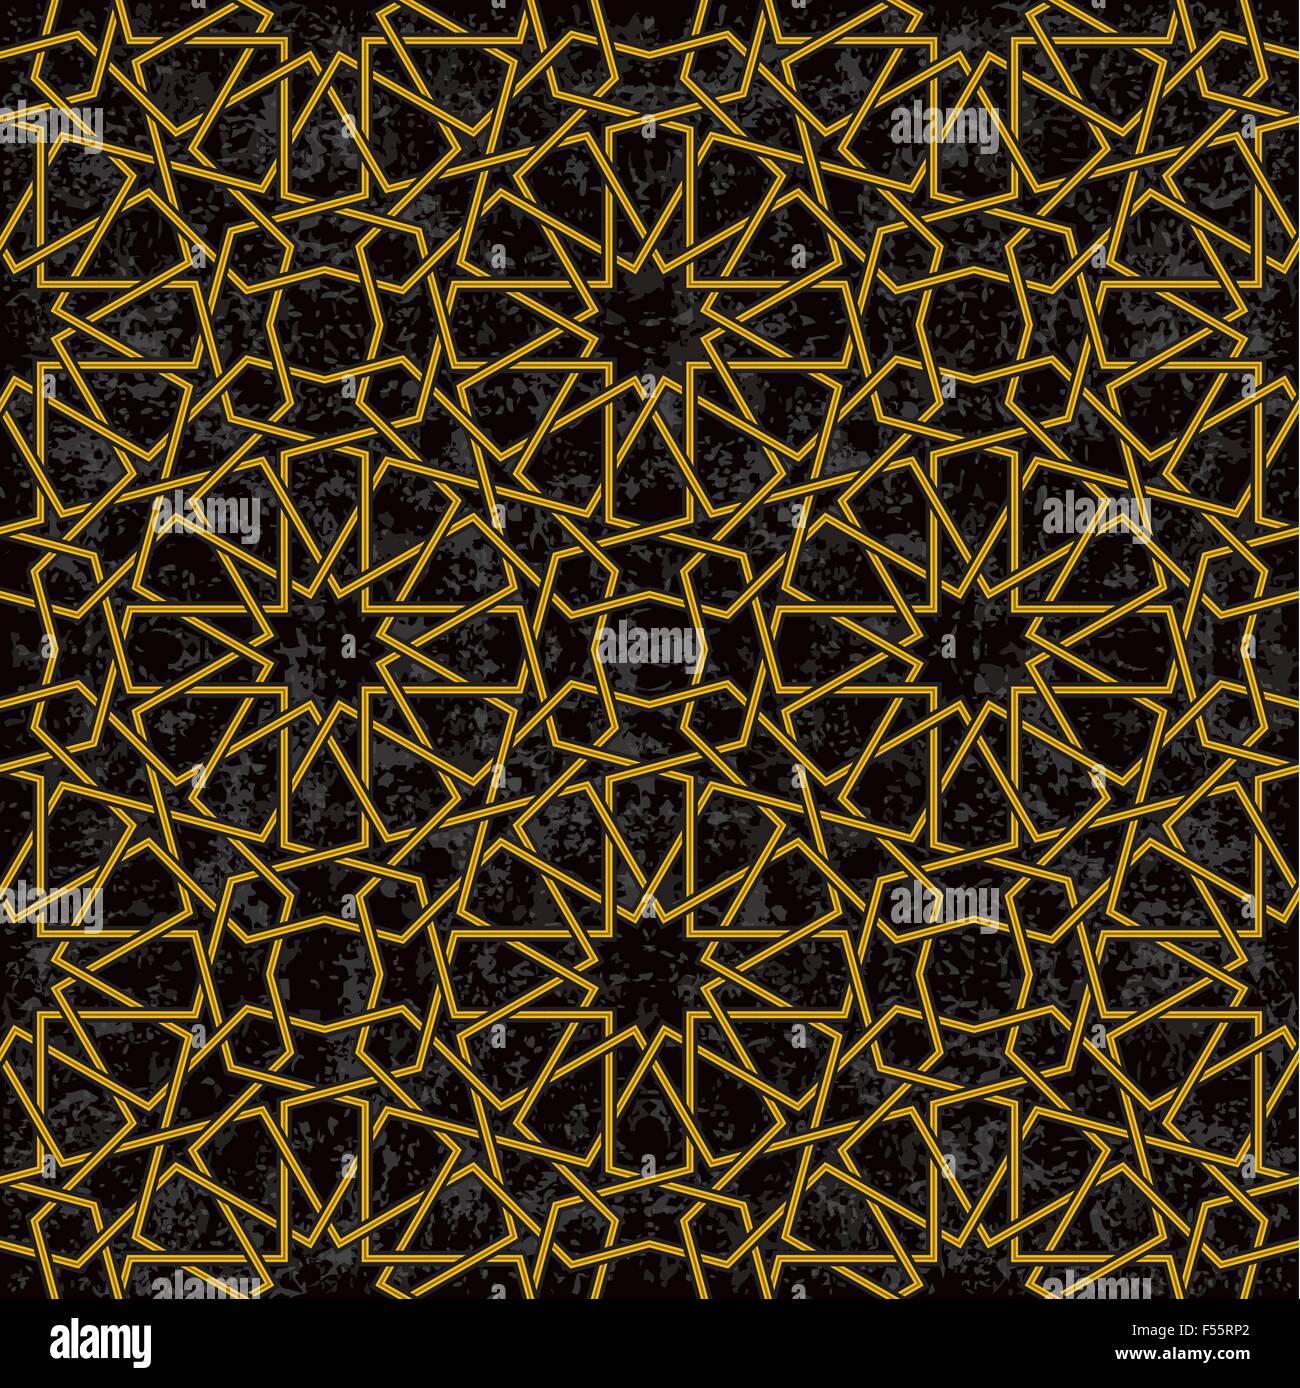 Línea dorada estrella antecedentes en estilo árabe, ilustración vectorial Imagen De Stock